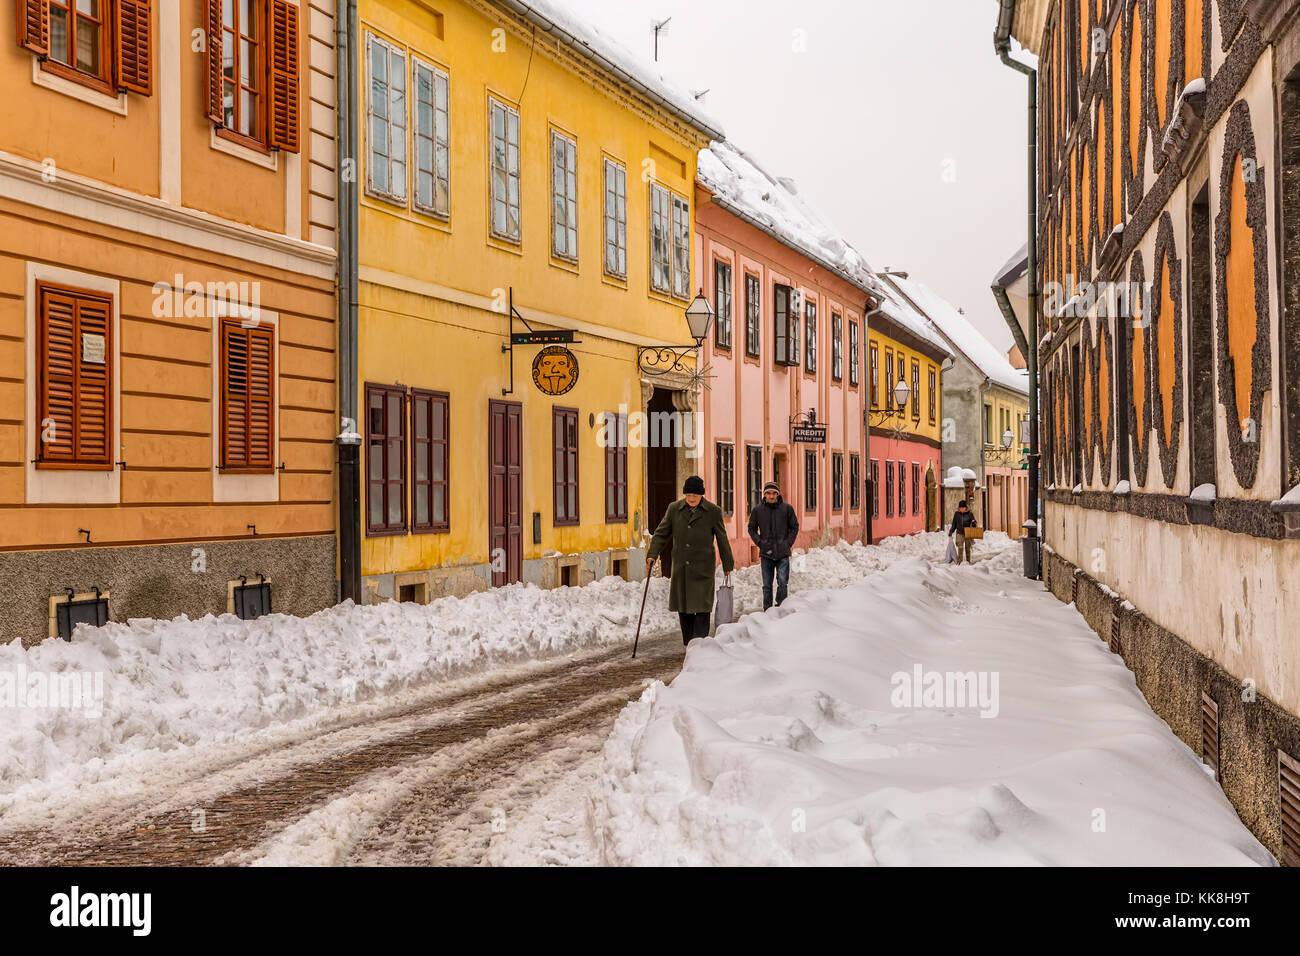 Varazdin old city winter time - Stock Image